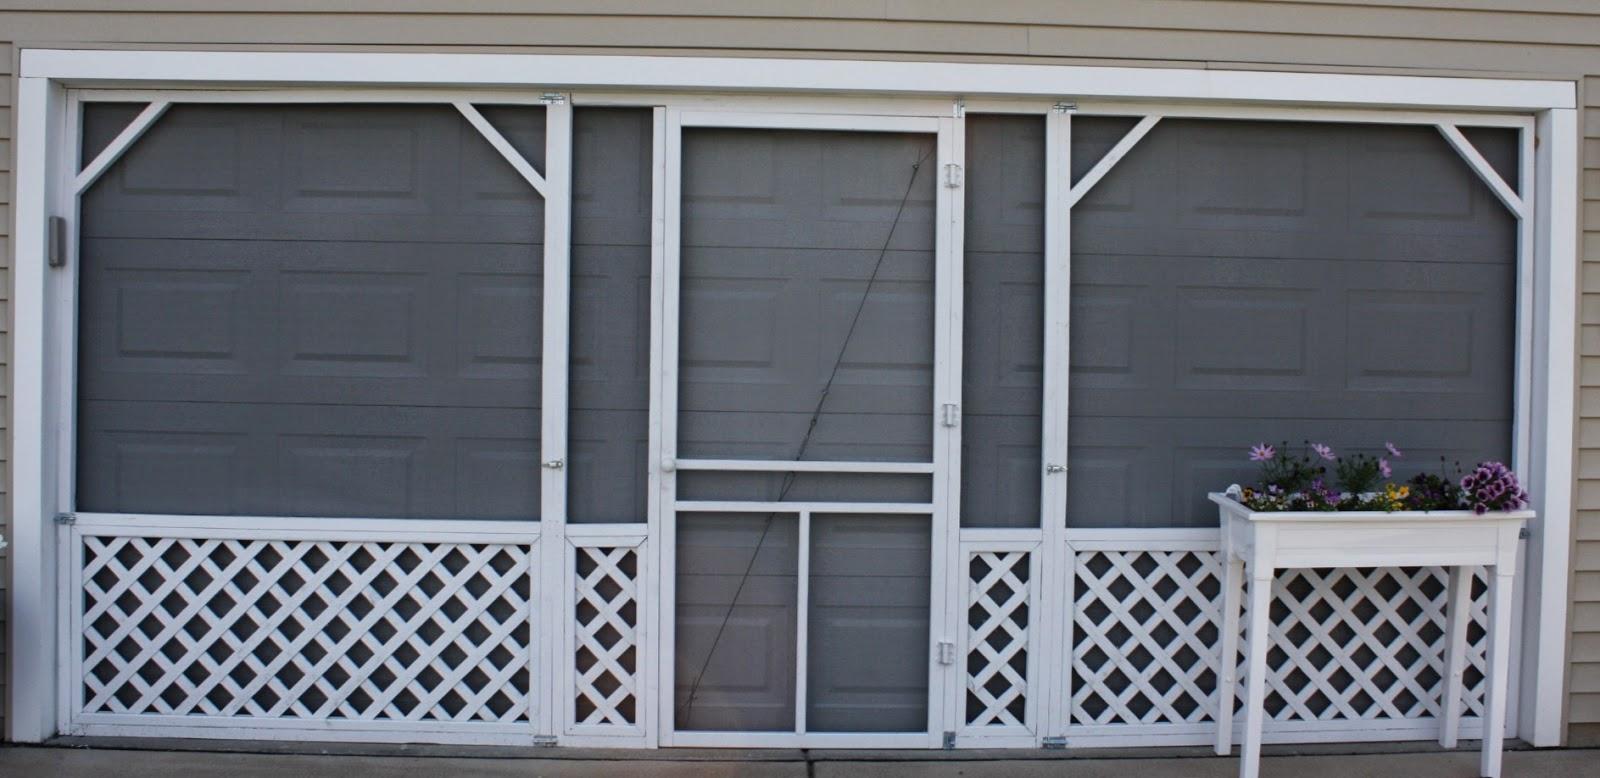 Famous Ryan Homes Florence in Buffalo: DIY Garage Screen TO18